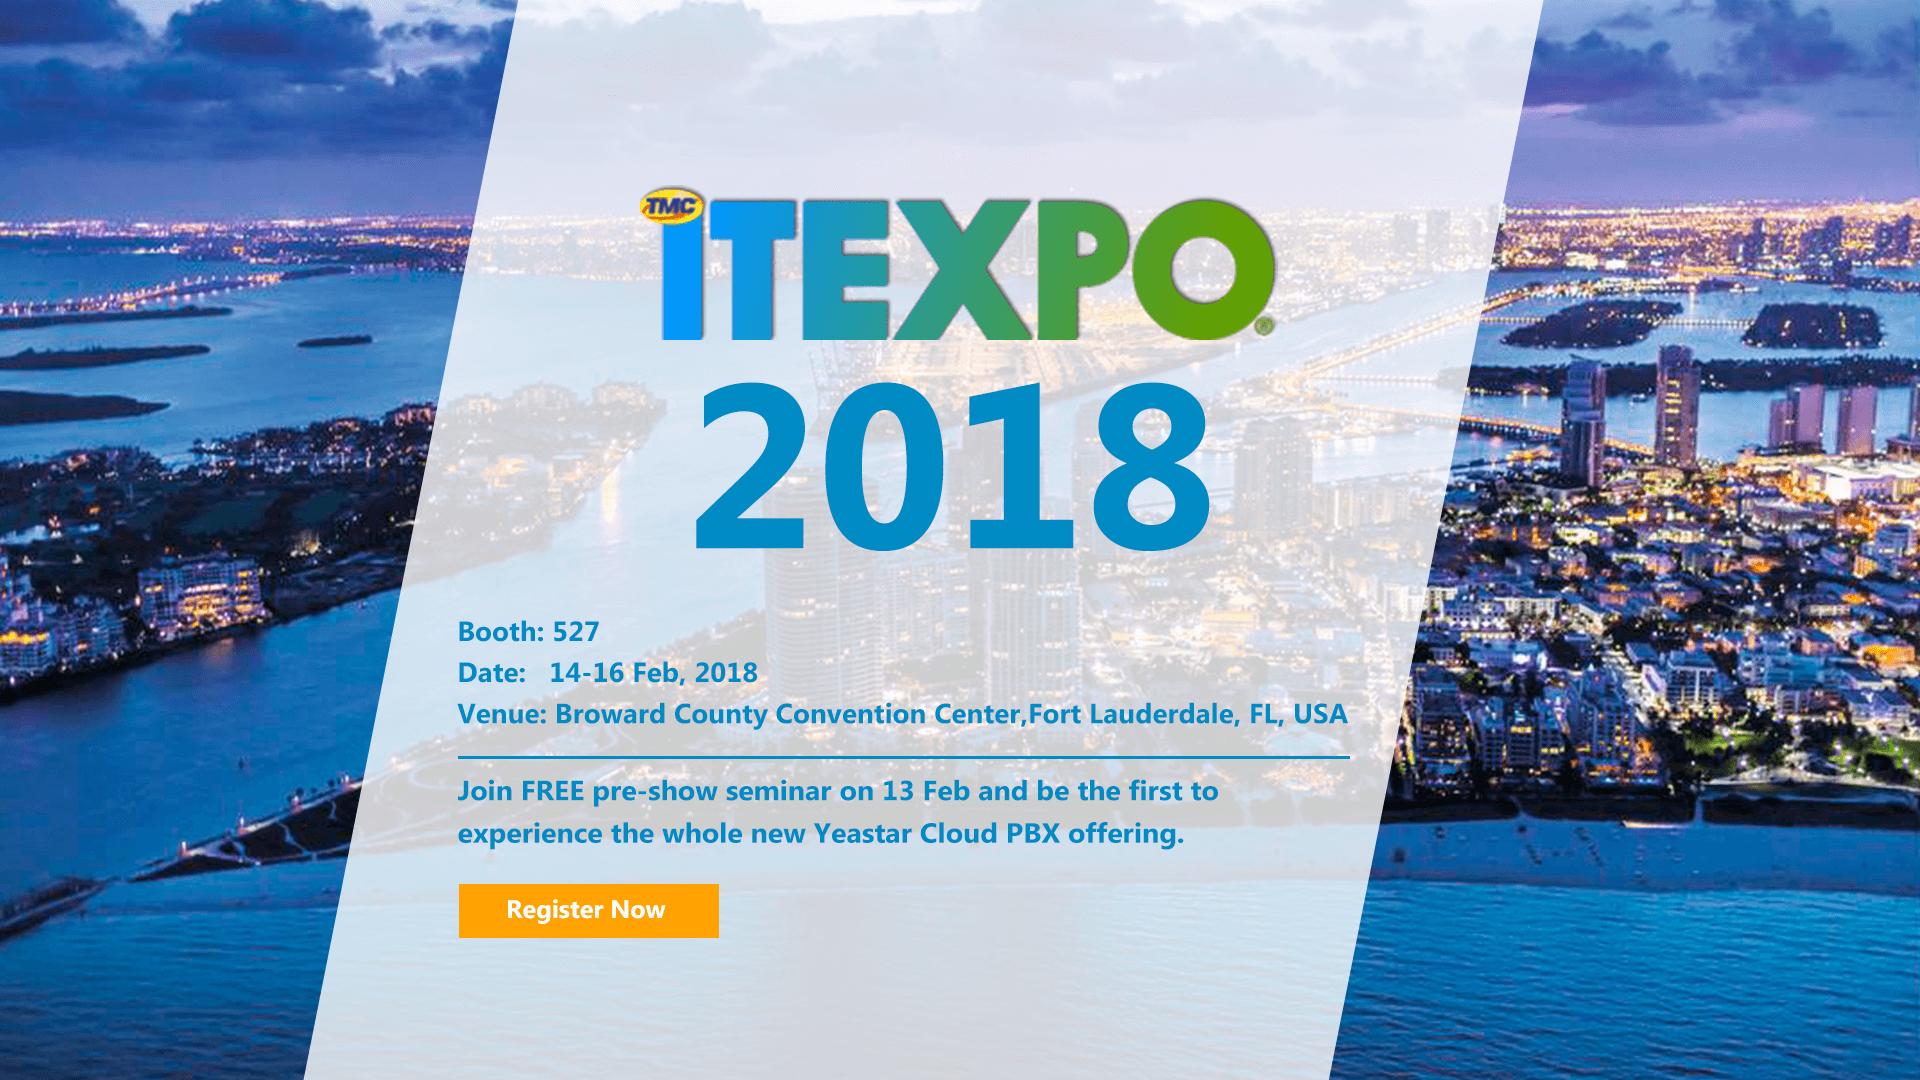 ITEXPO East 2018